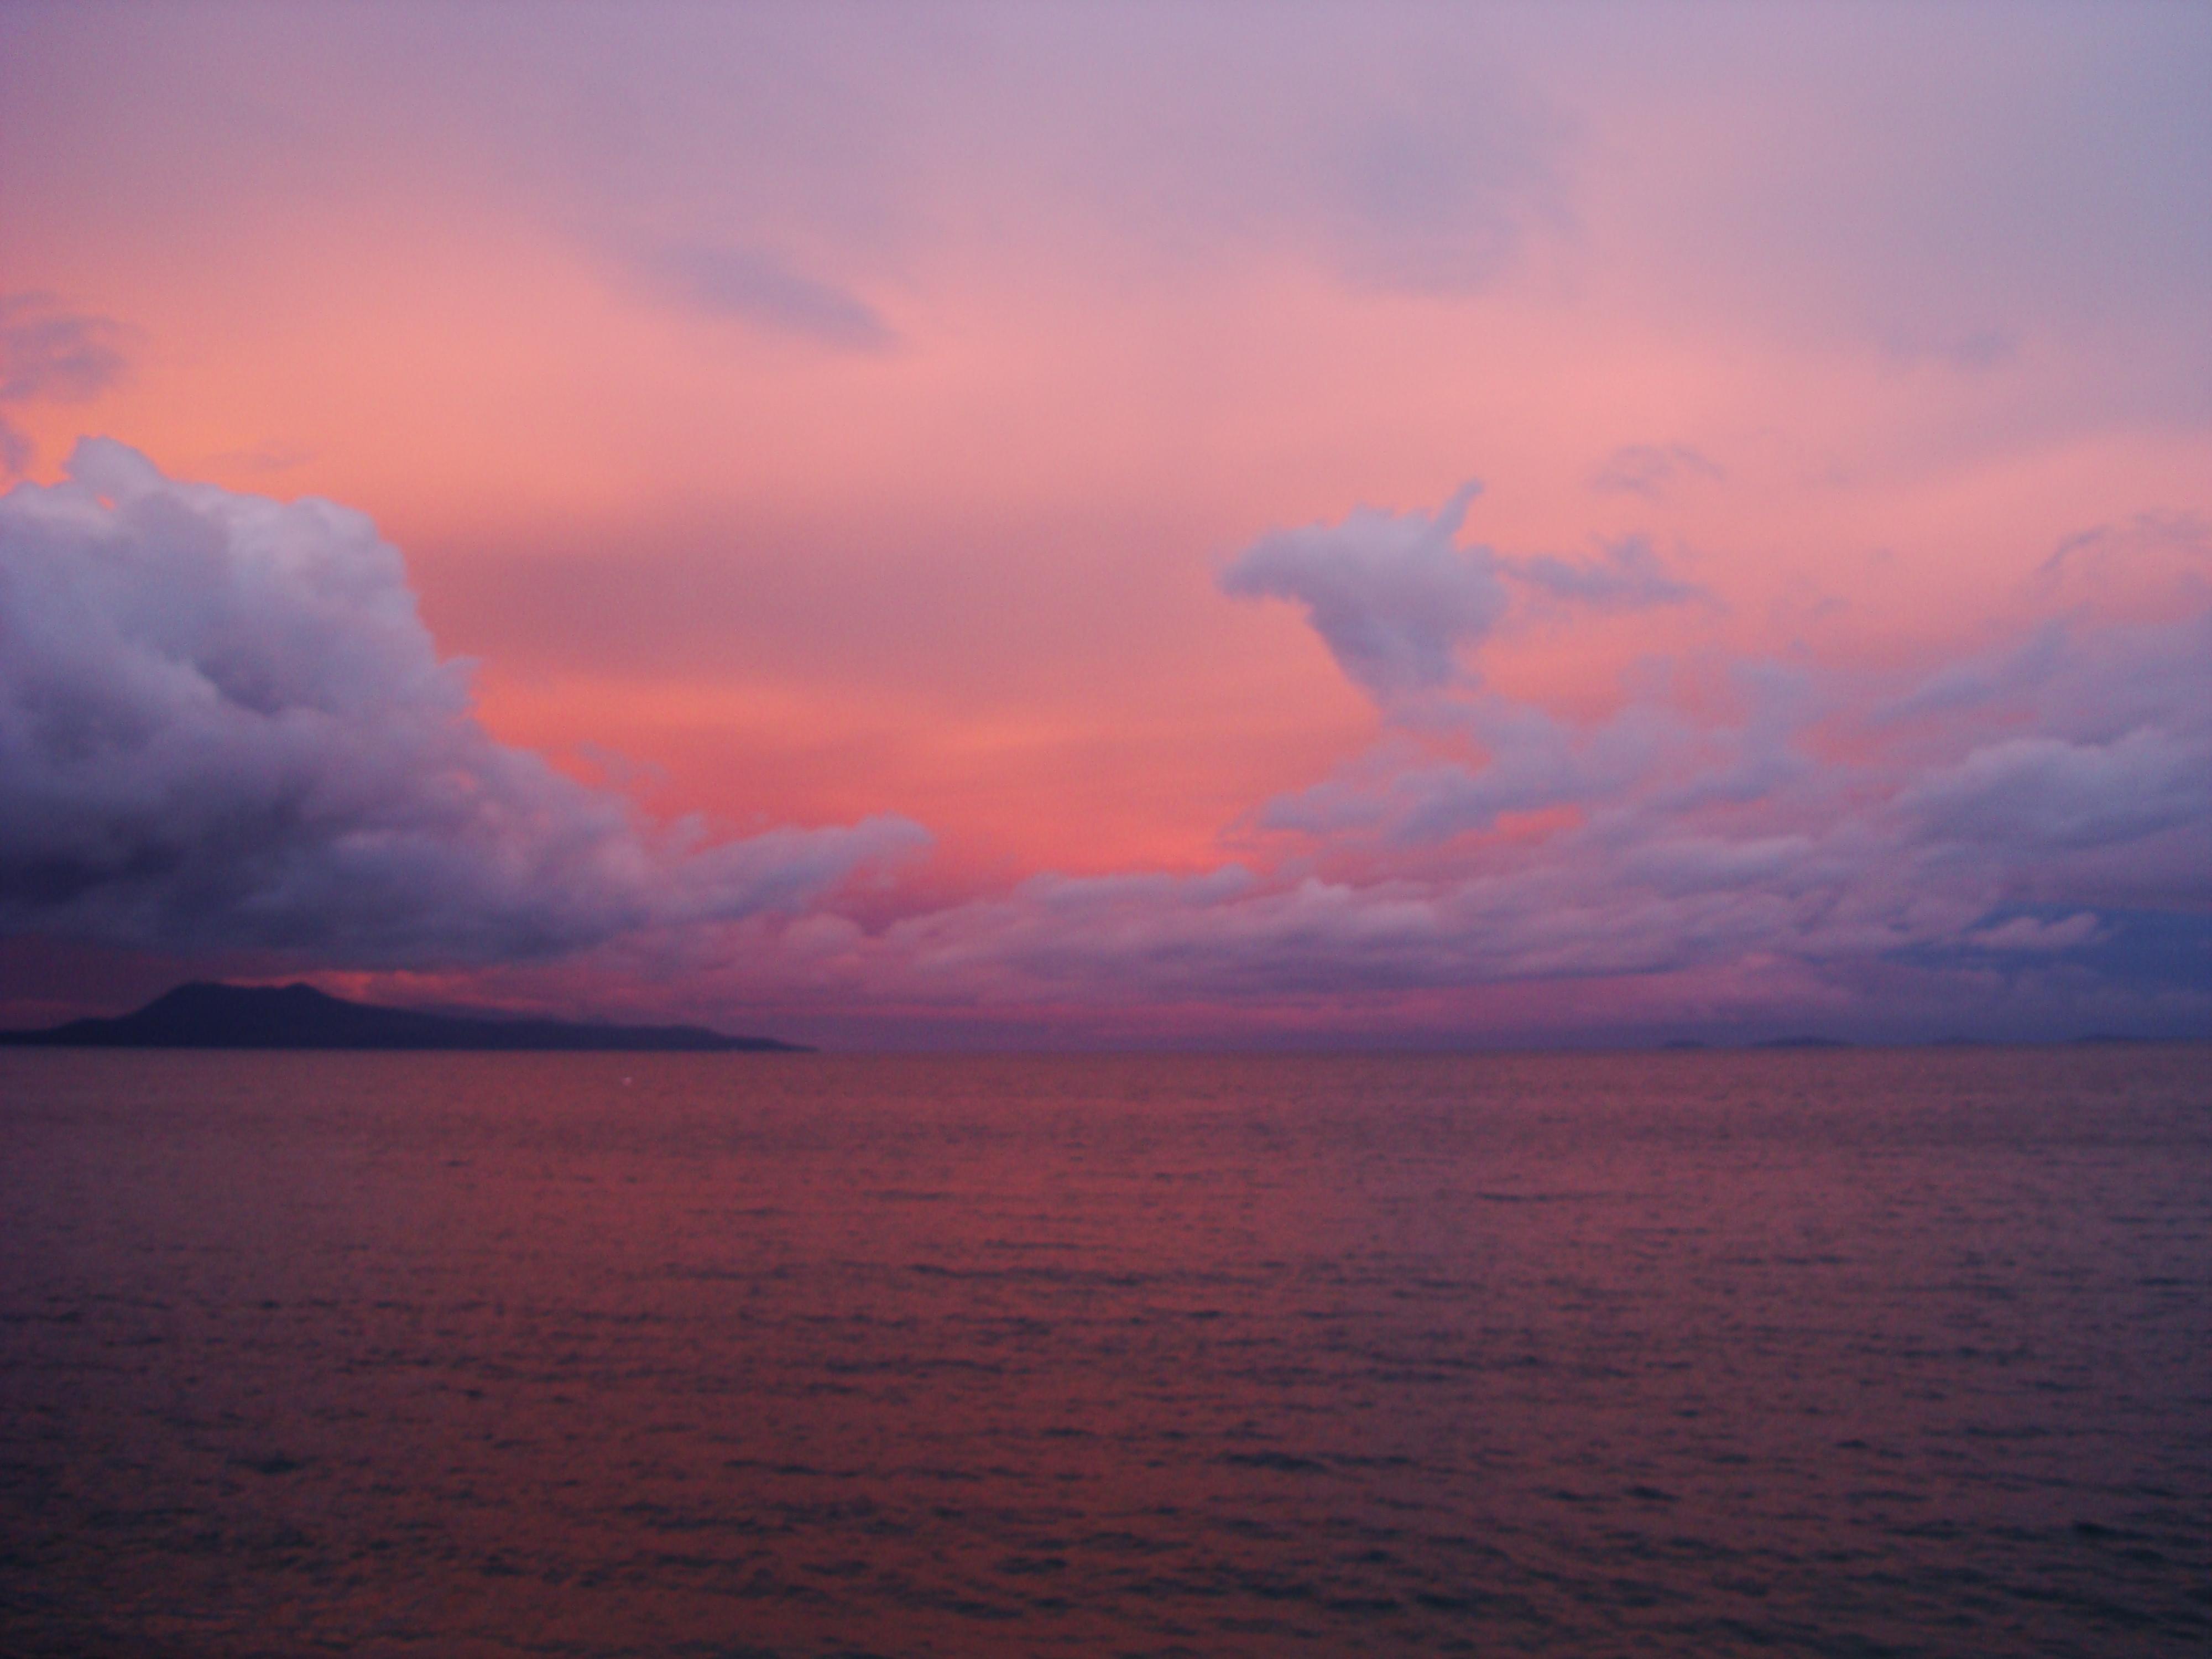 Sunrise Philippines Mindoro Island Tabinay 30